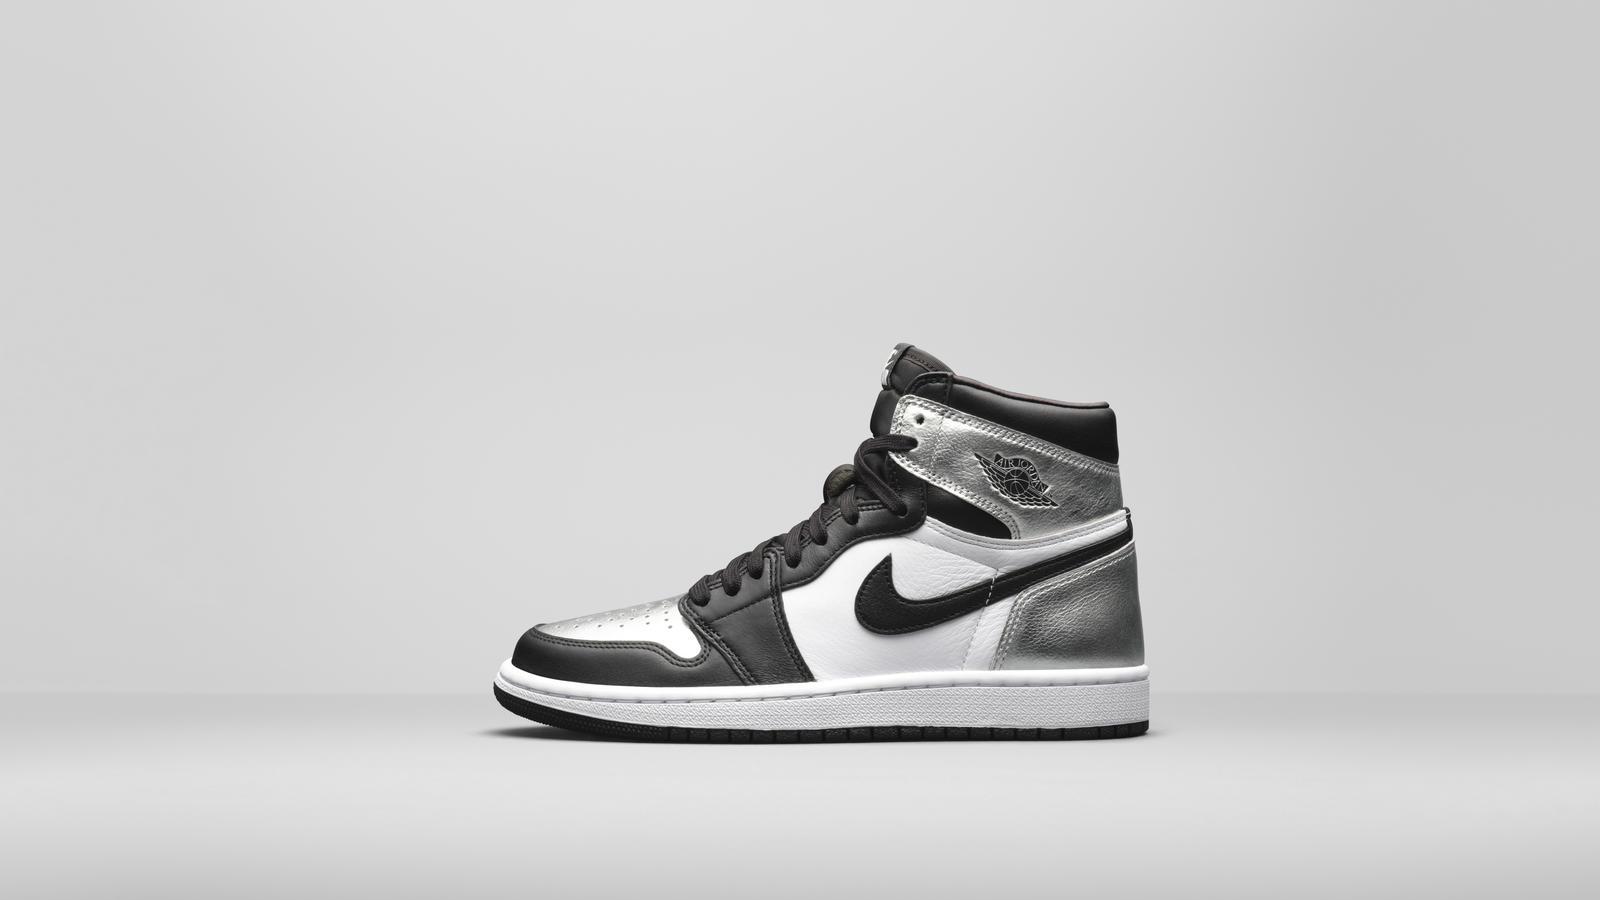 Jordan Brand Spring 2021 Retro Releases - Nike News